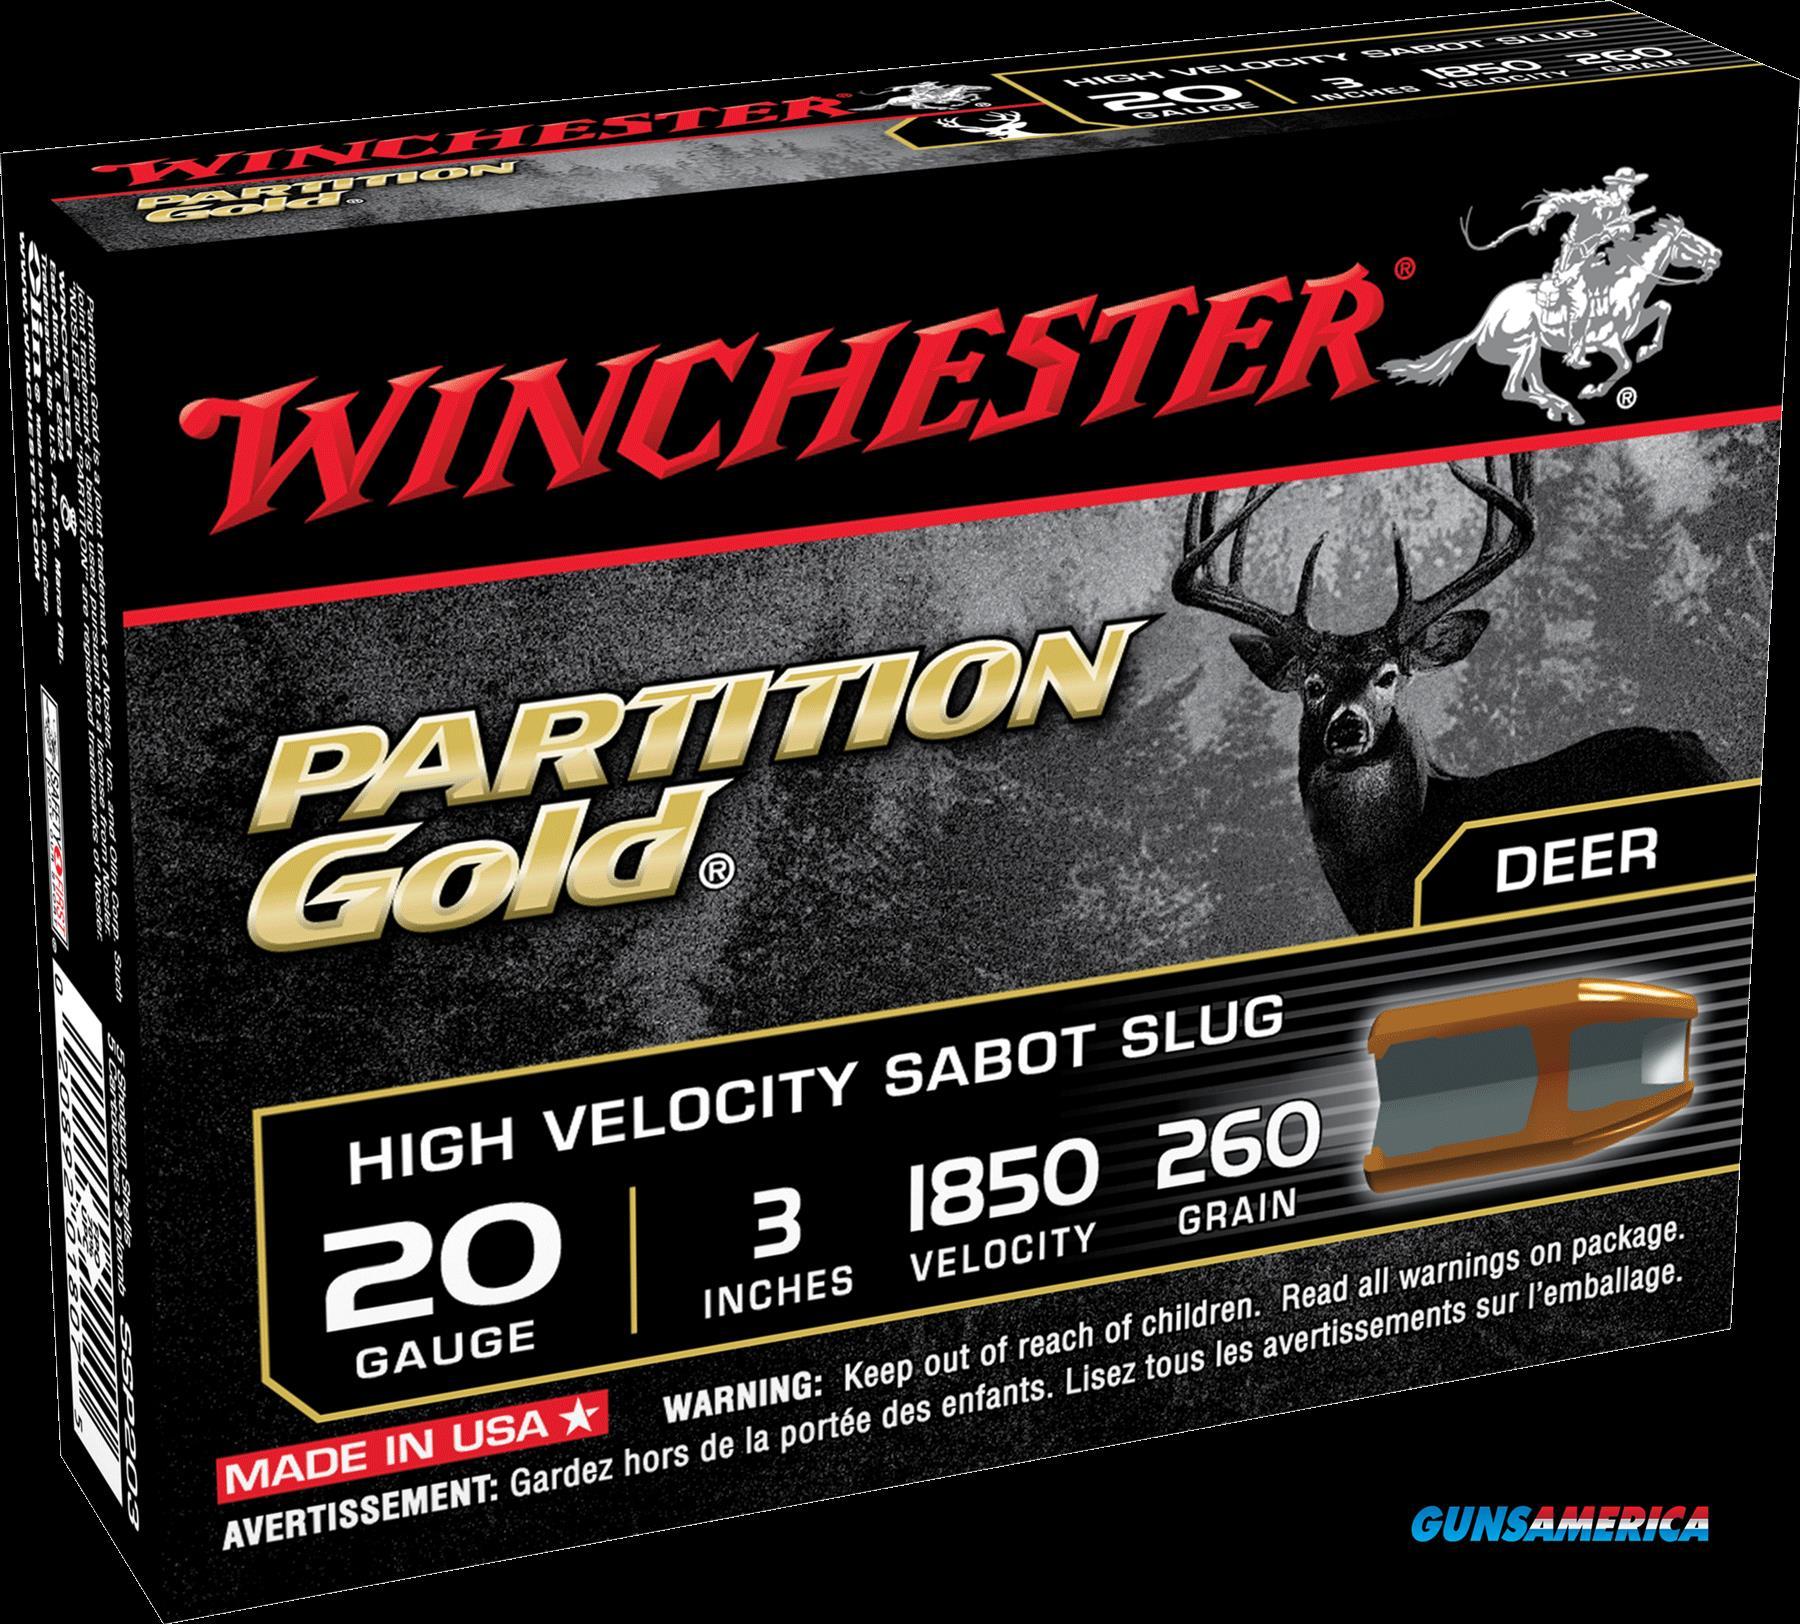 Winchester Ammo Partition Gold, Win Ssp203  Suppar Gld Sabot   Slug  5-20  Guns > Pistols > 1911 Pistol Copies (non-Colt)